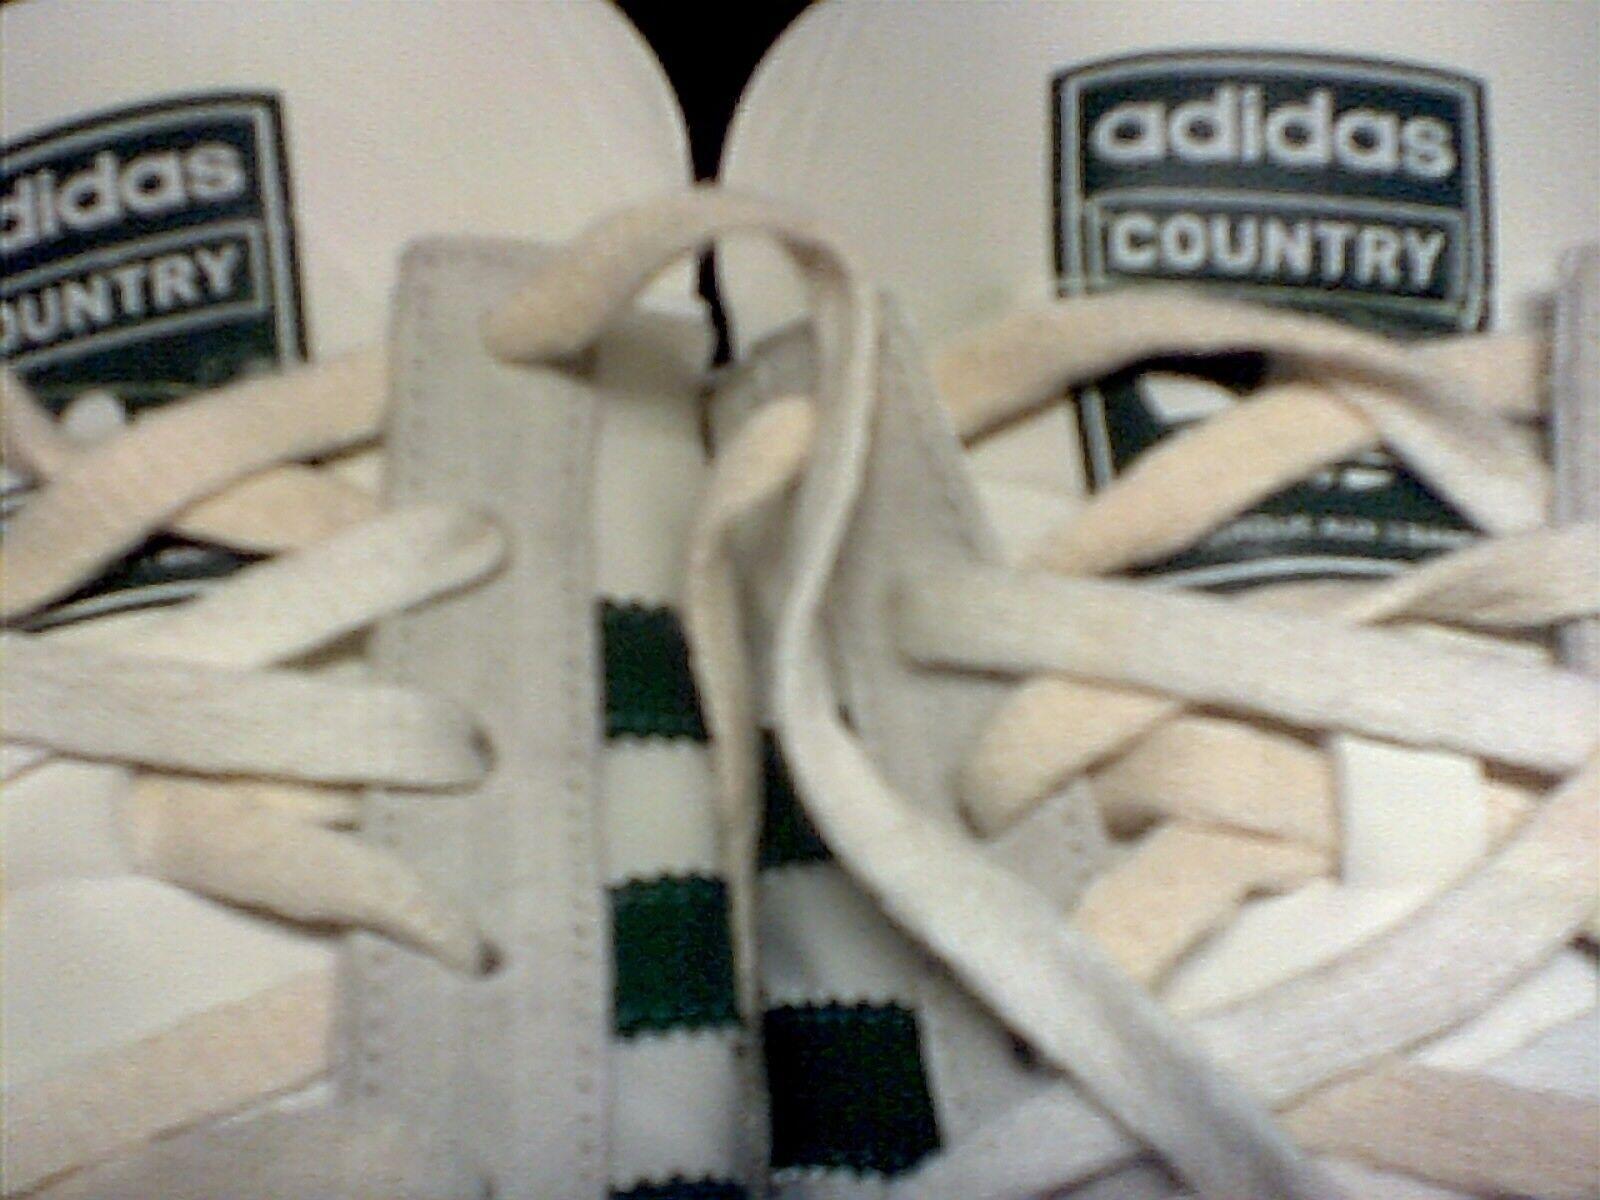 c911b30b3 ... Adidas white white white w  green stripes Country tennis shoes 2008 size  10 4ad397 ...